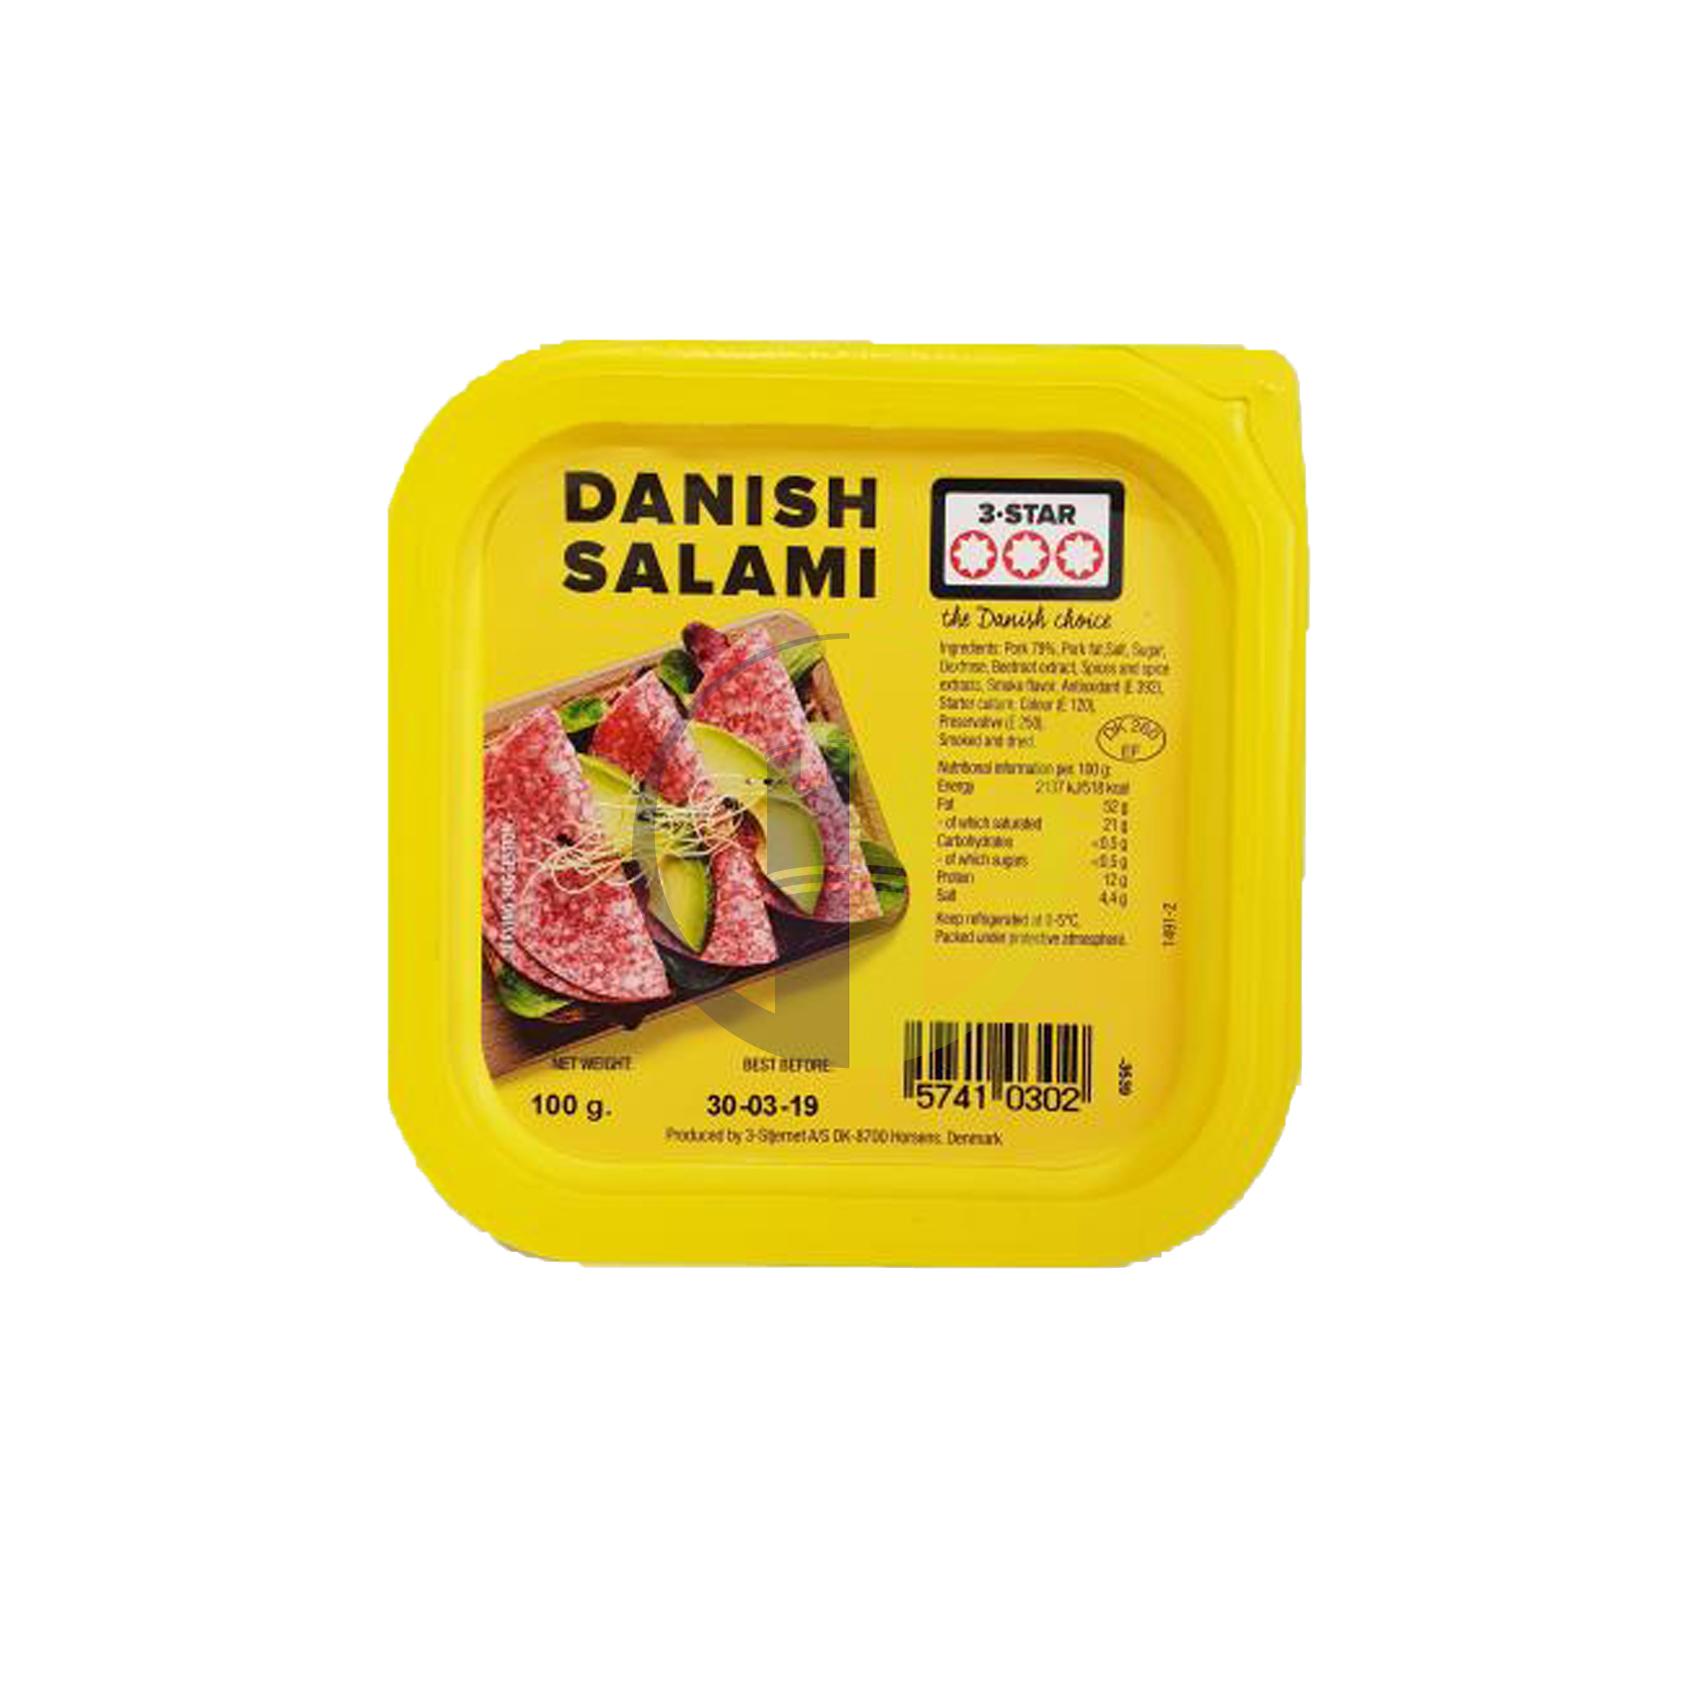 3 Star Danish Salami